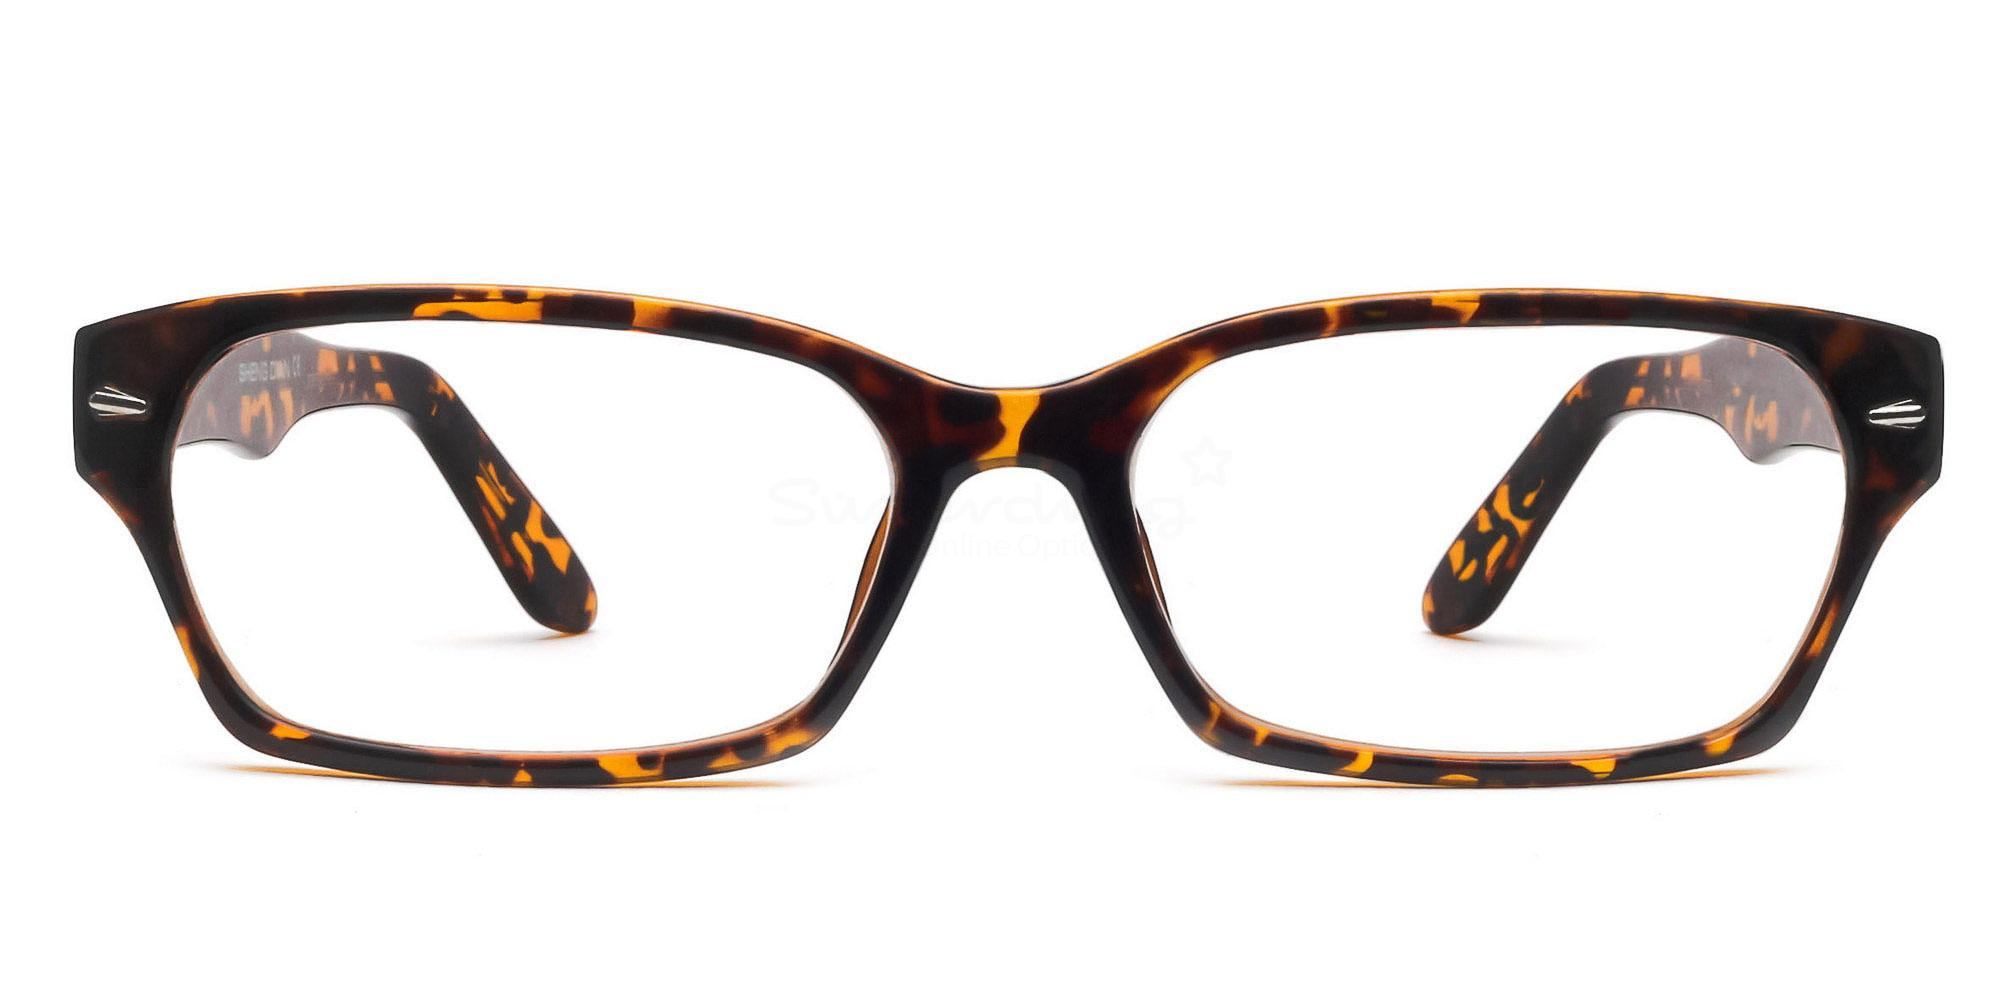 Demi P2267 - Demi Glasses, Helium